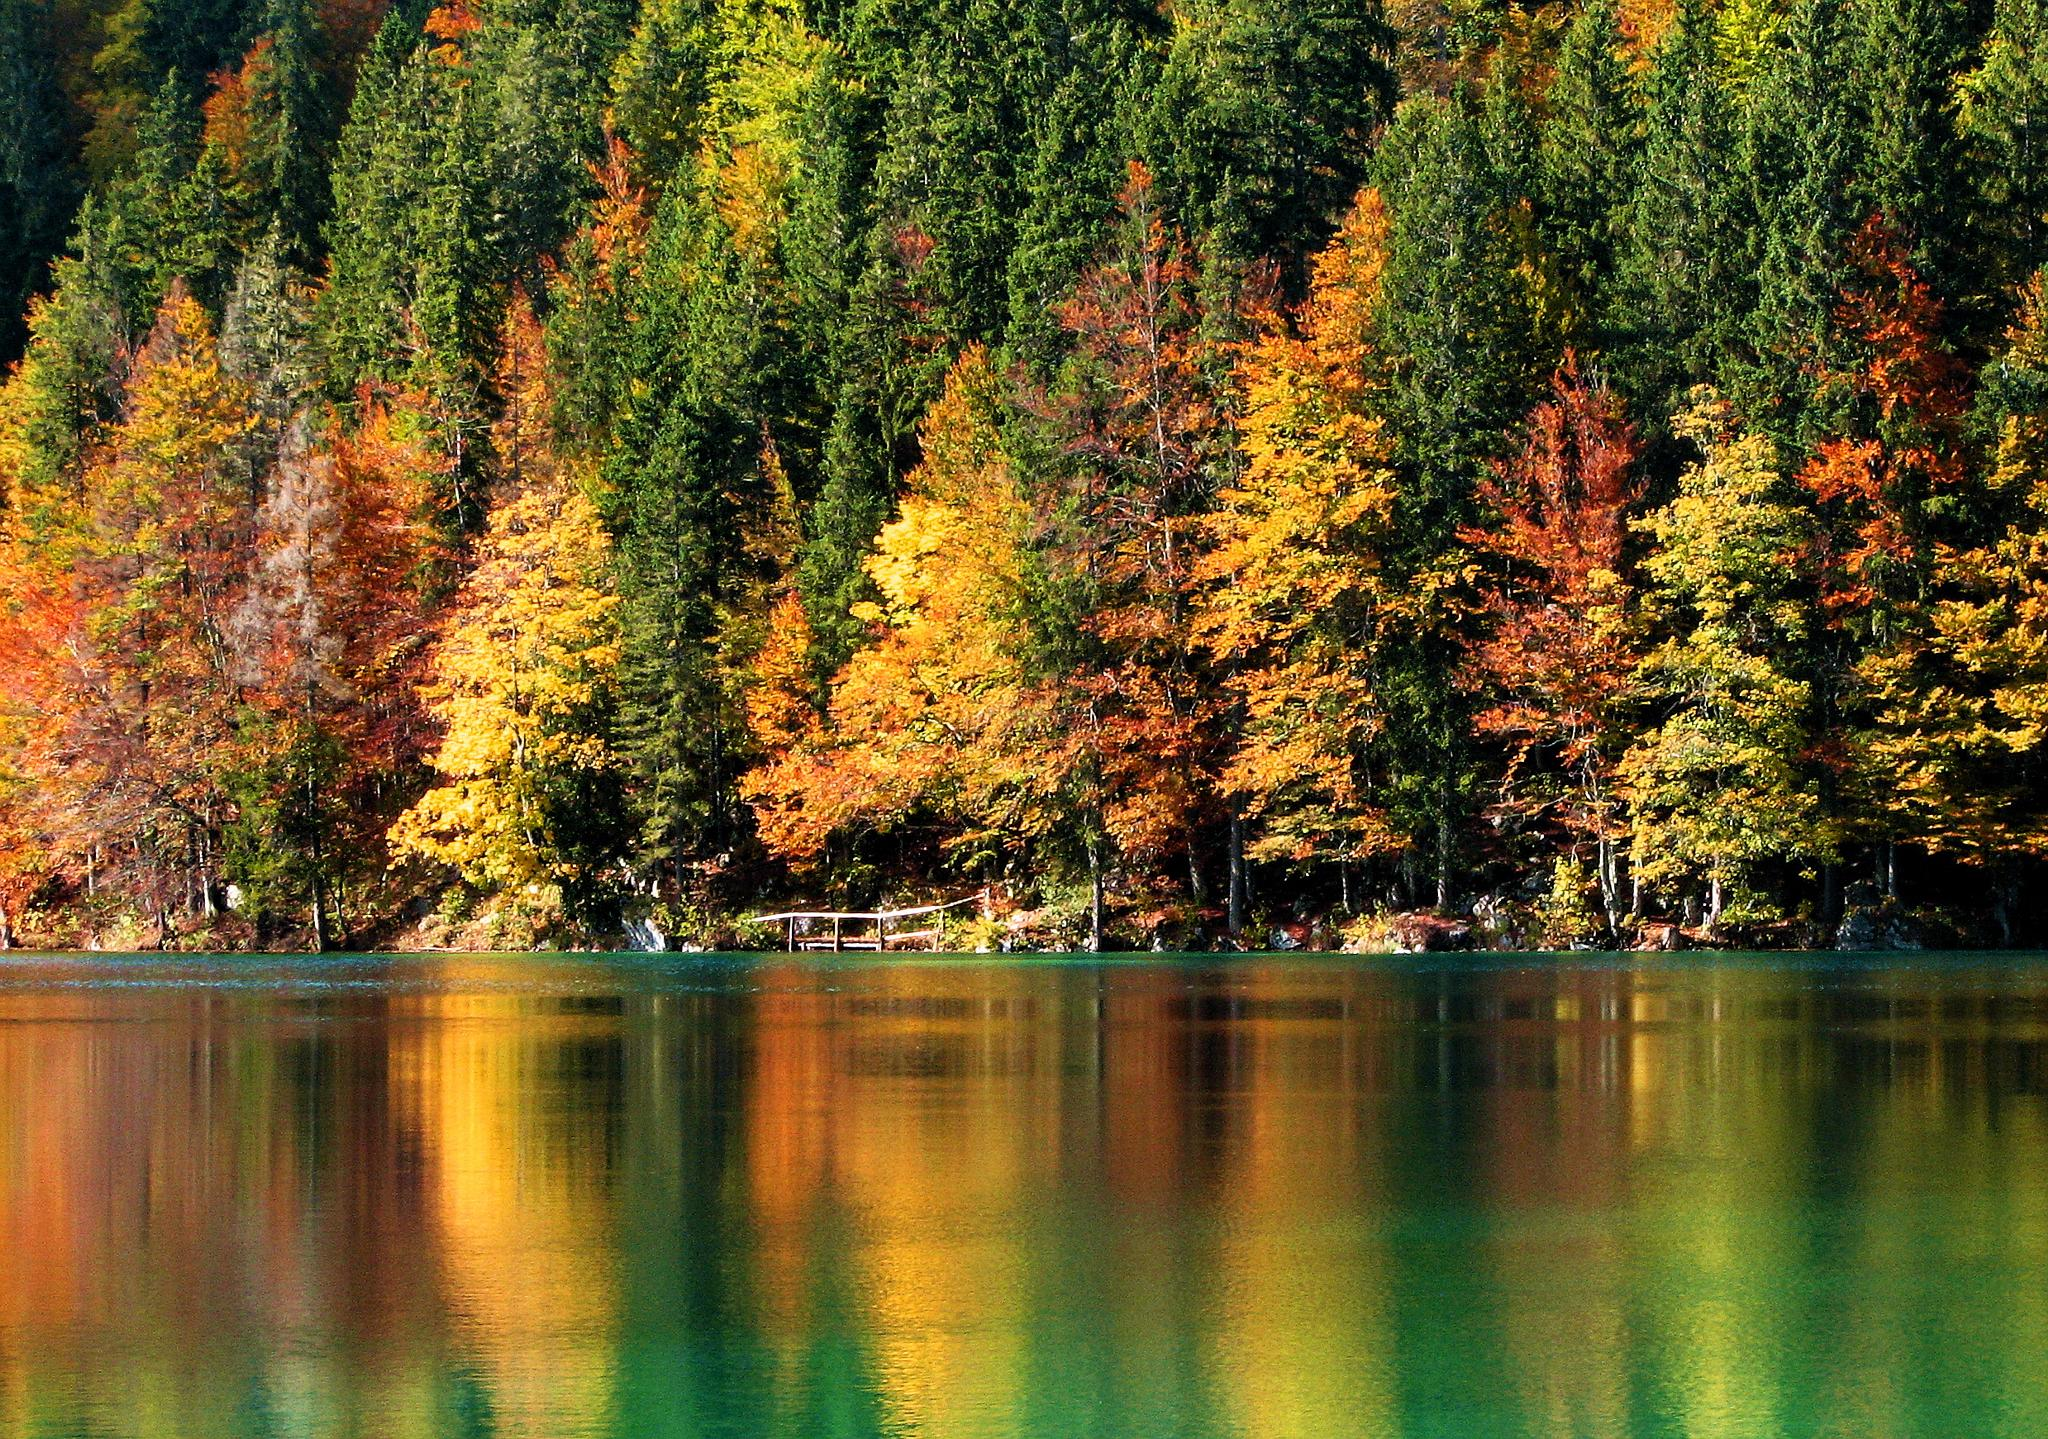 Lake Fusine - Belopeška jezera by BernardaBizjak